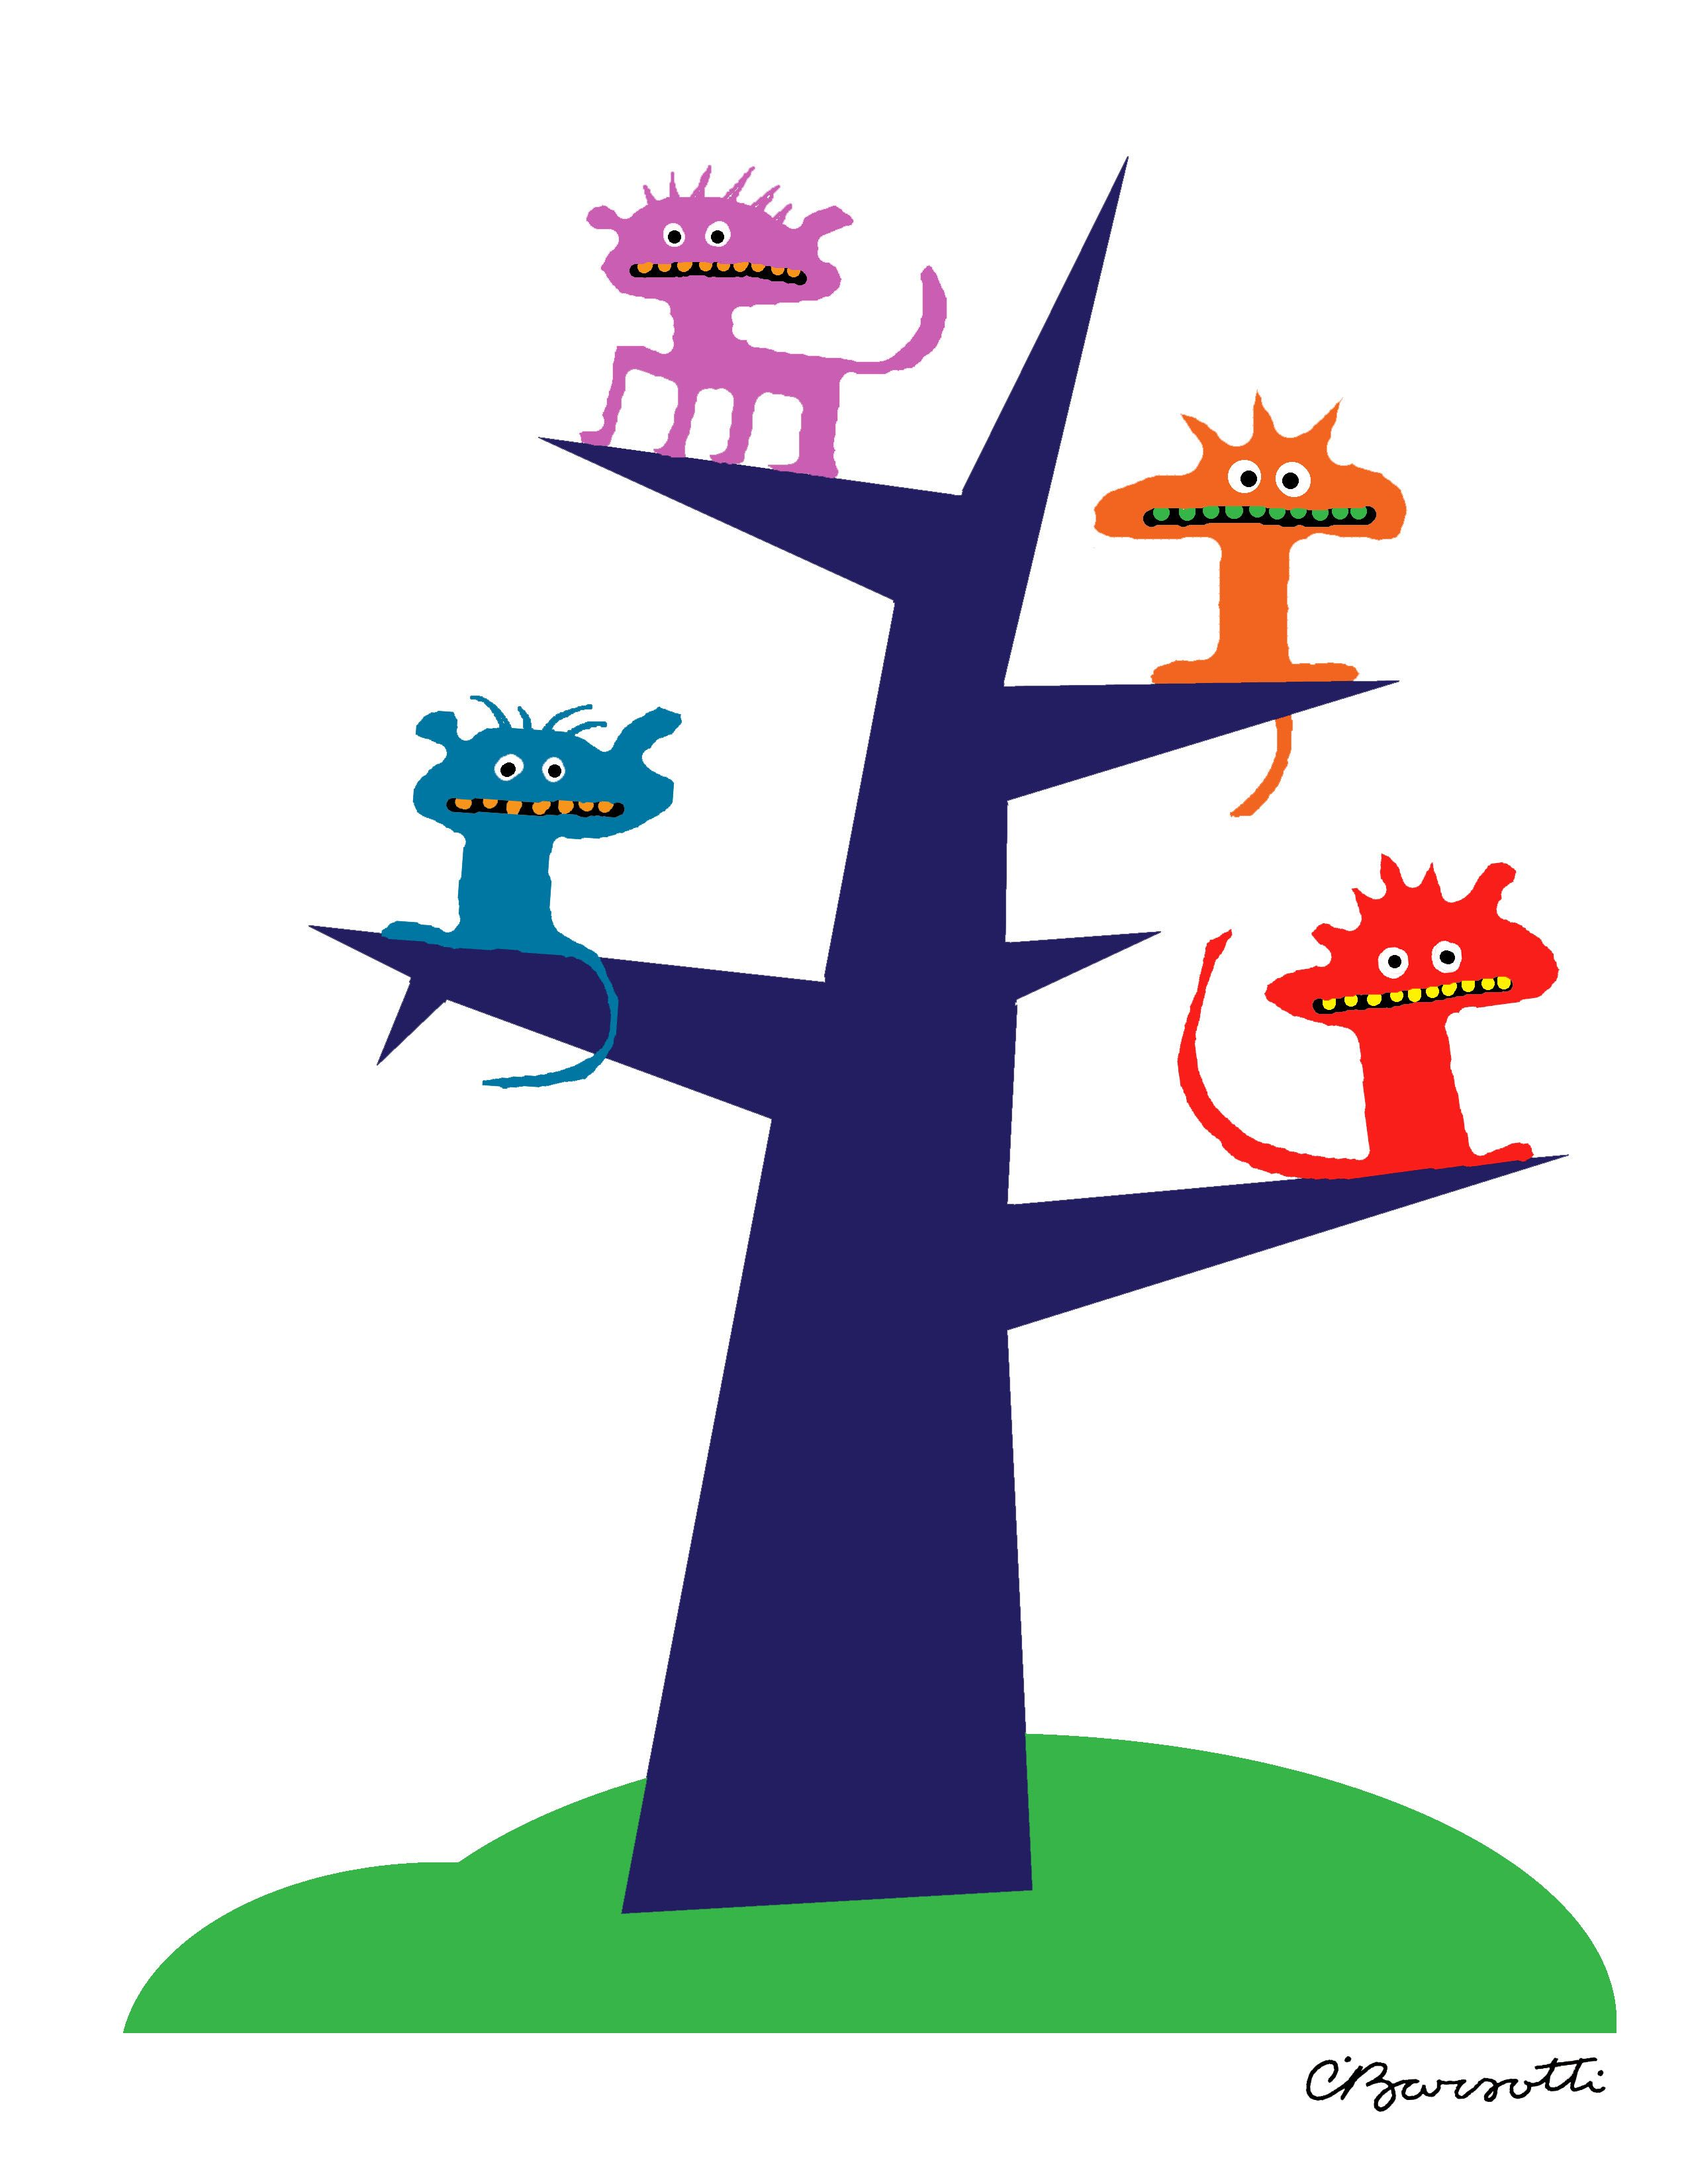 Critters in a tree. Cartoon Logos, Cartoon, Games